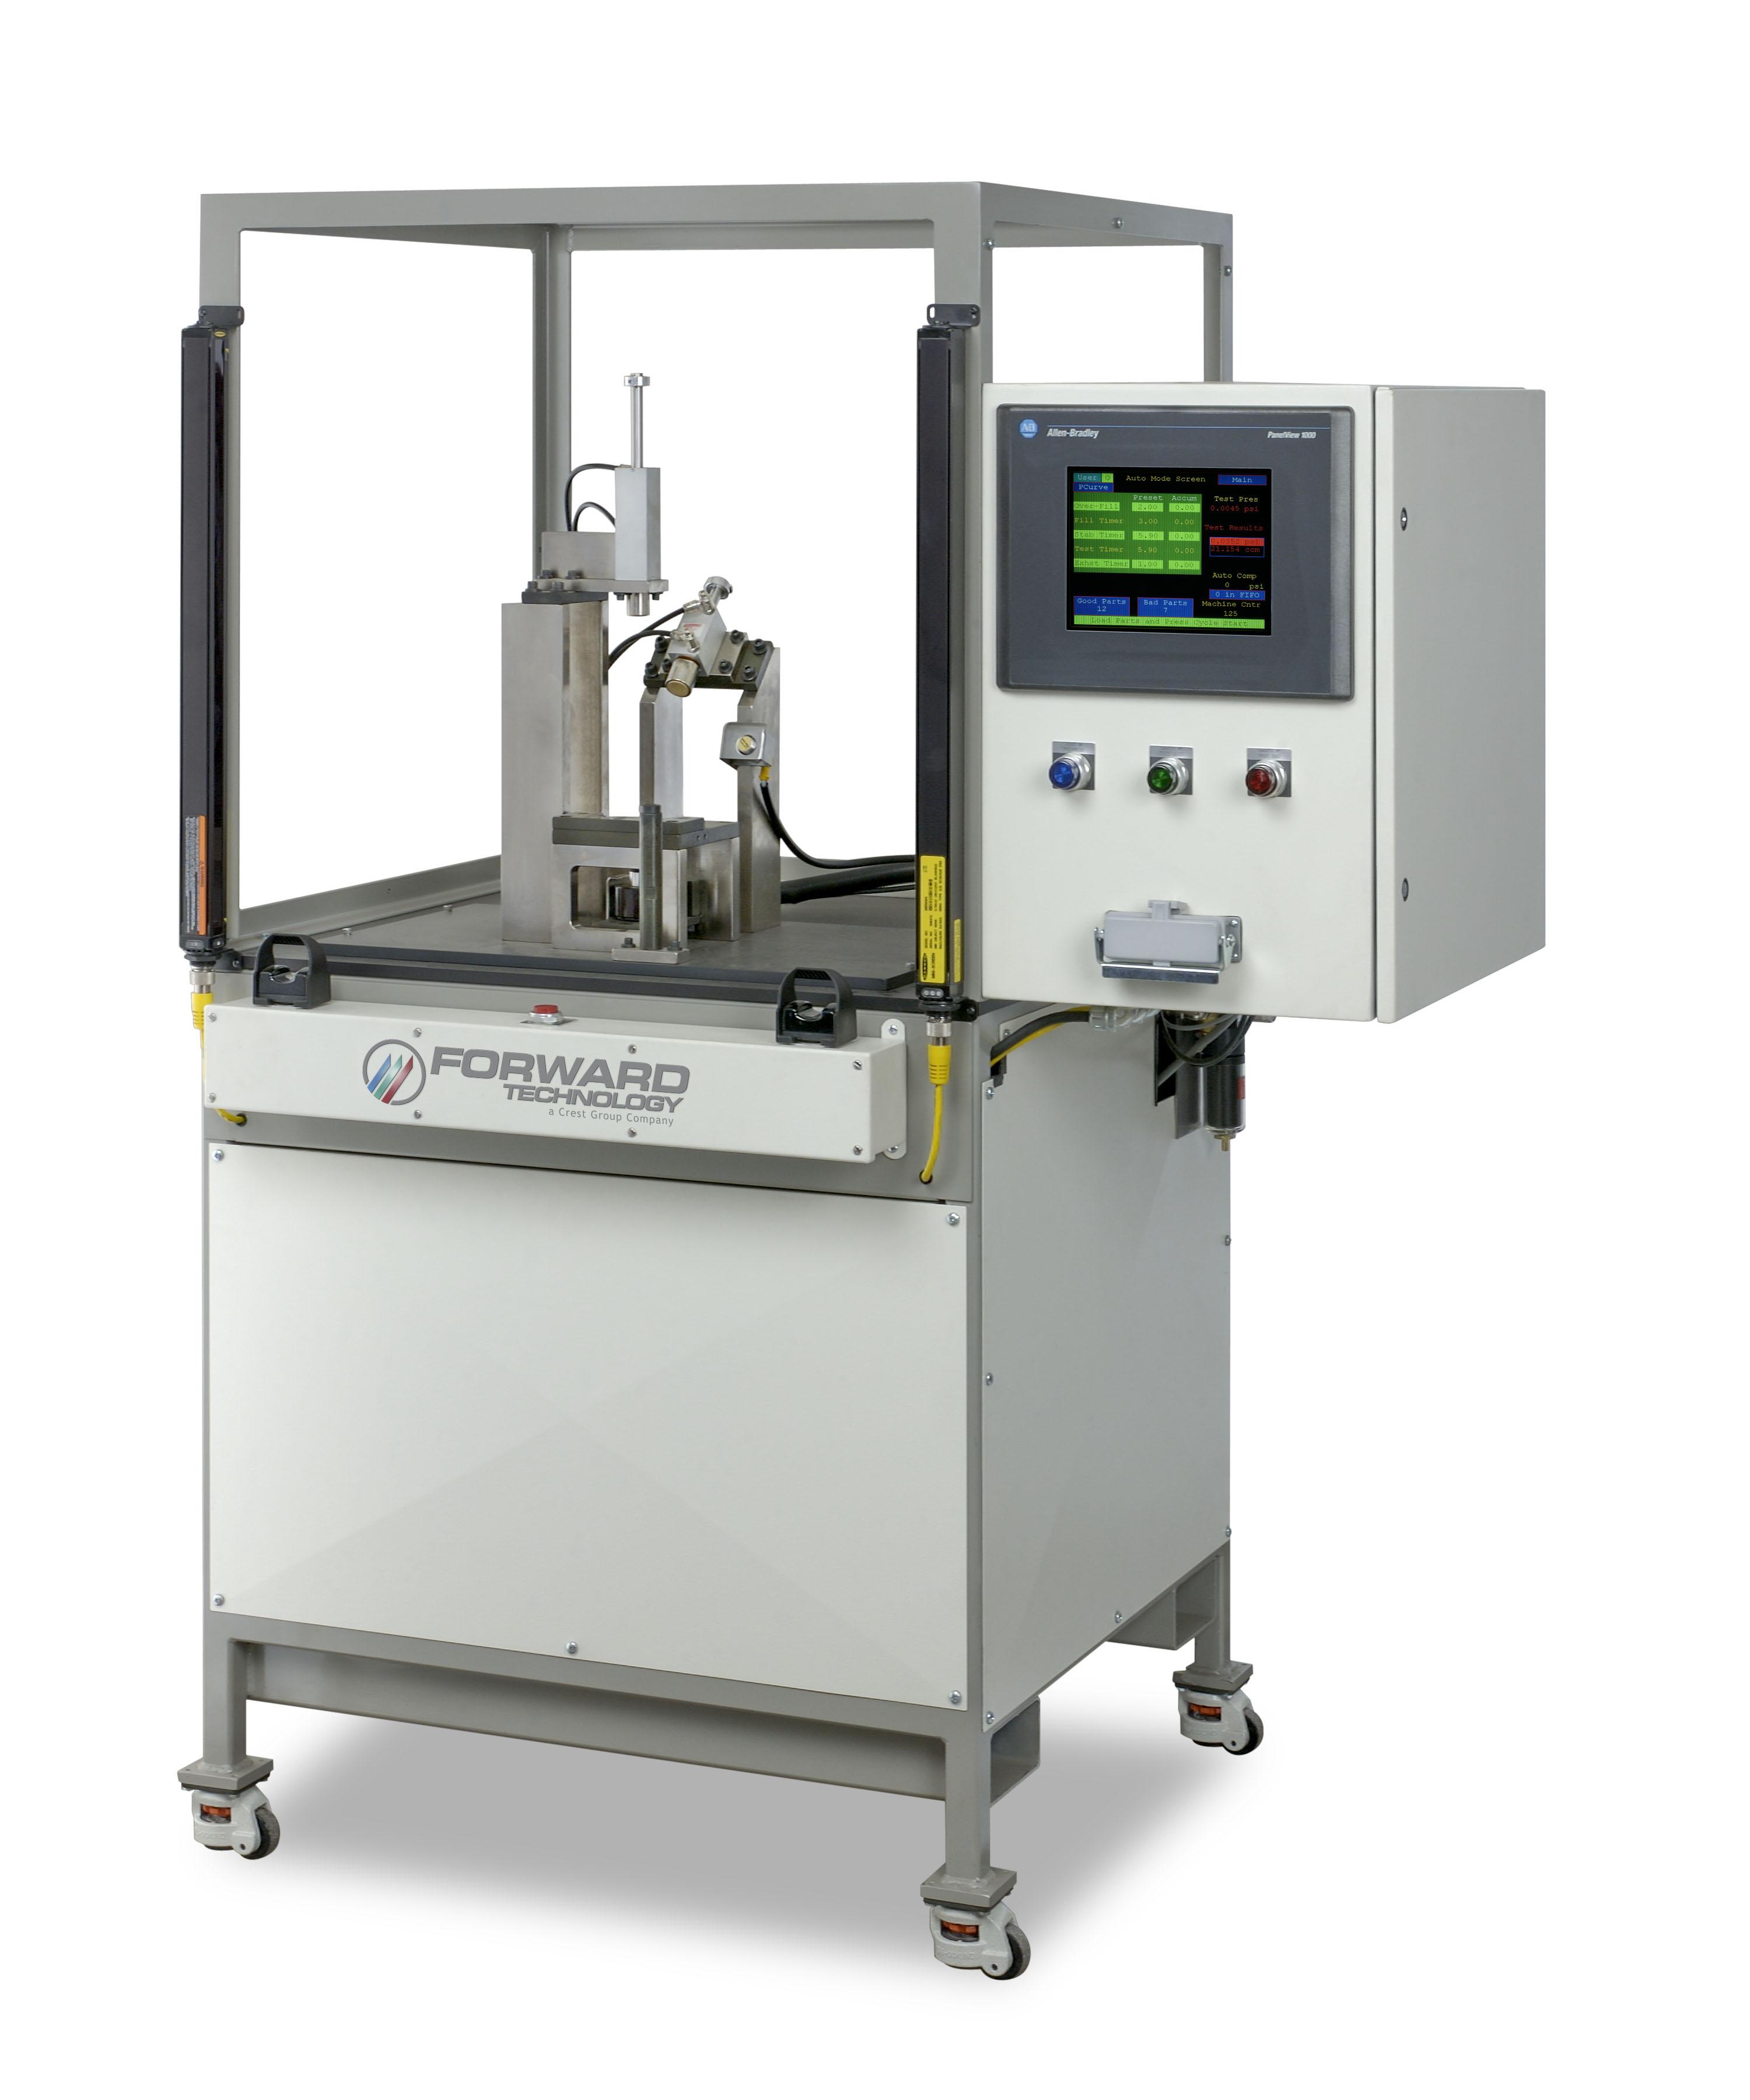 Forward Technology   Plastic Welders, Testing & Automation